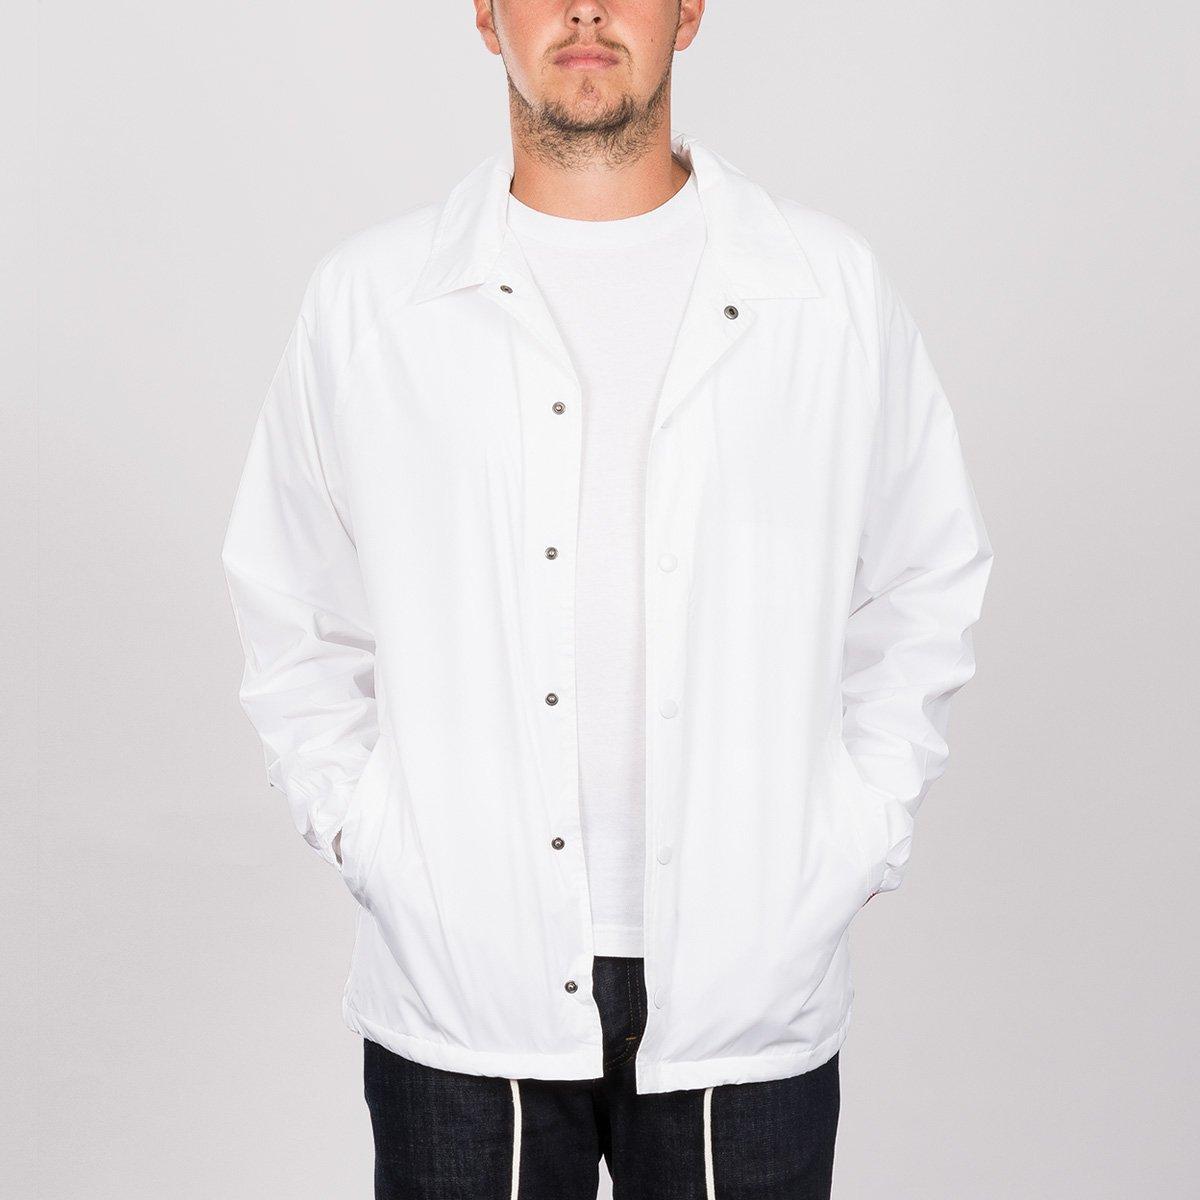 dc-skate-coach-jacket-white-s646999-04.1441.jpg